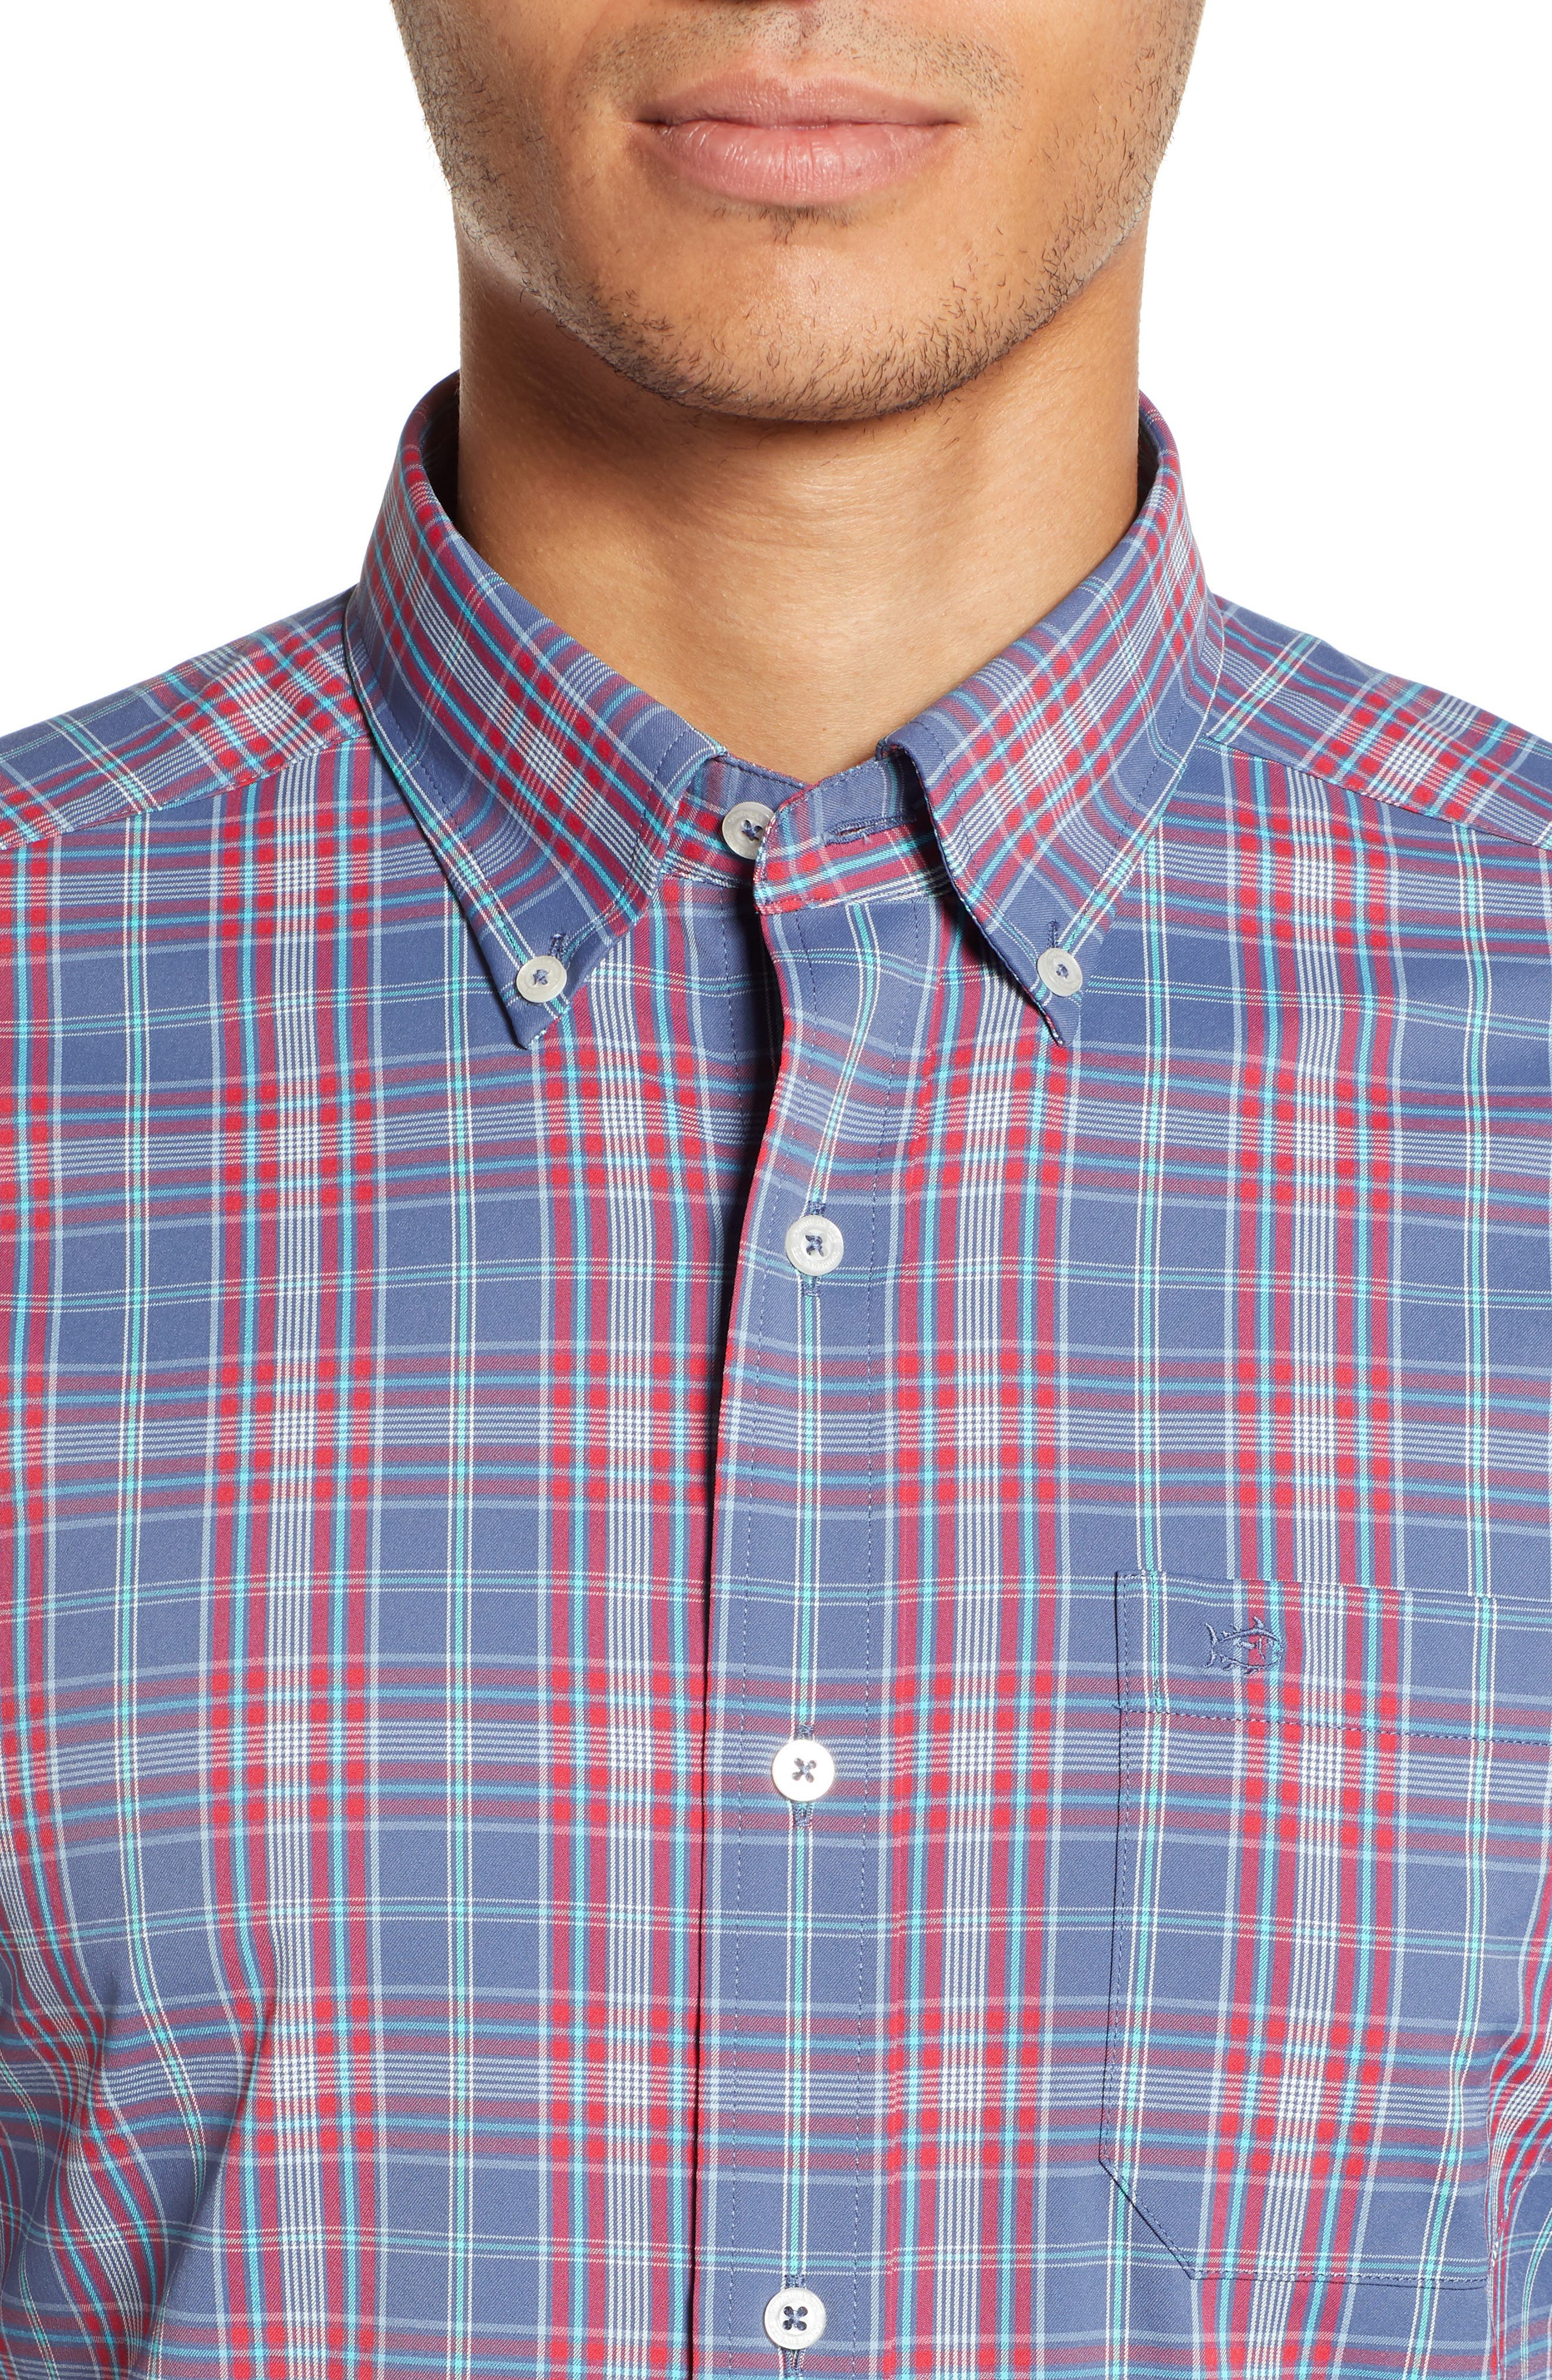 Lodge Intercoastal Regular Fit Plaid Performance Sport Shirt,                             Alternate thumbnail 2, color,                             LIGHT INDIGO